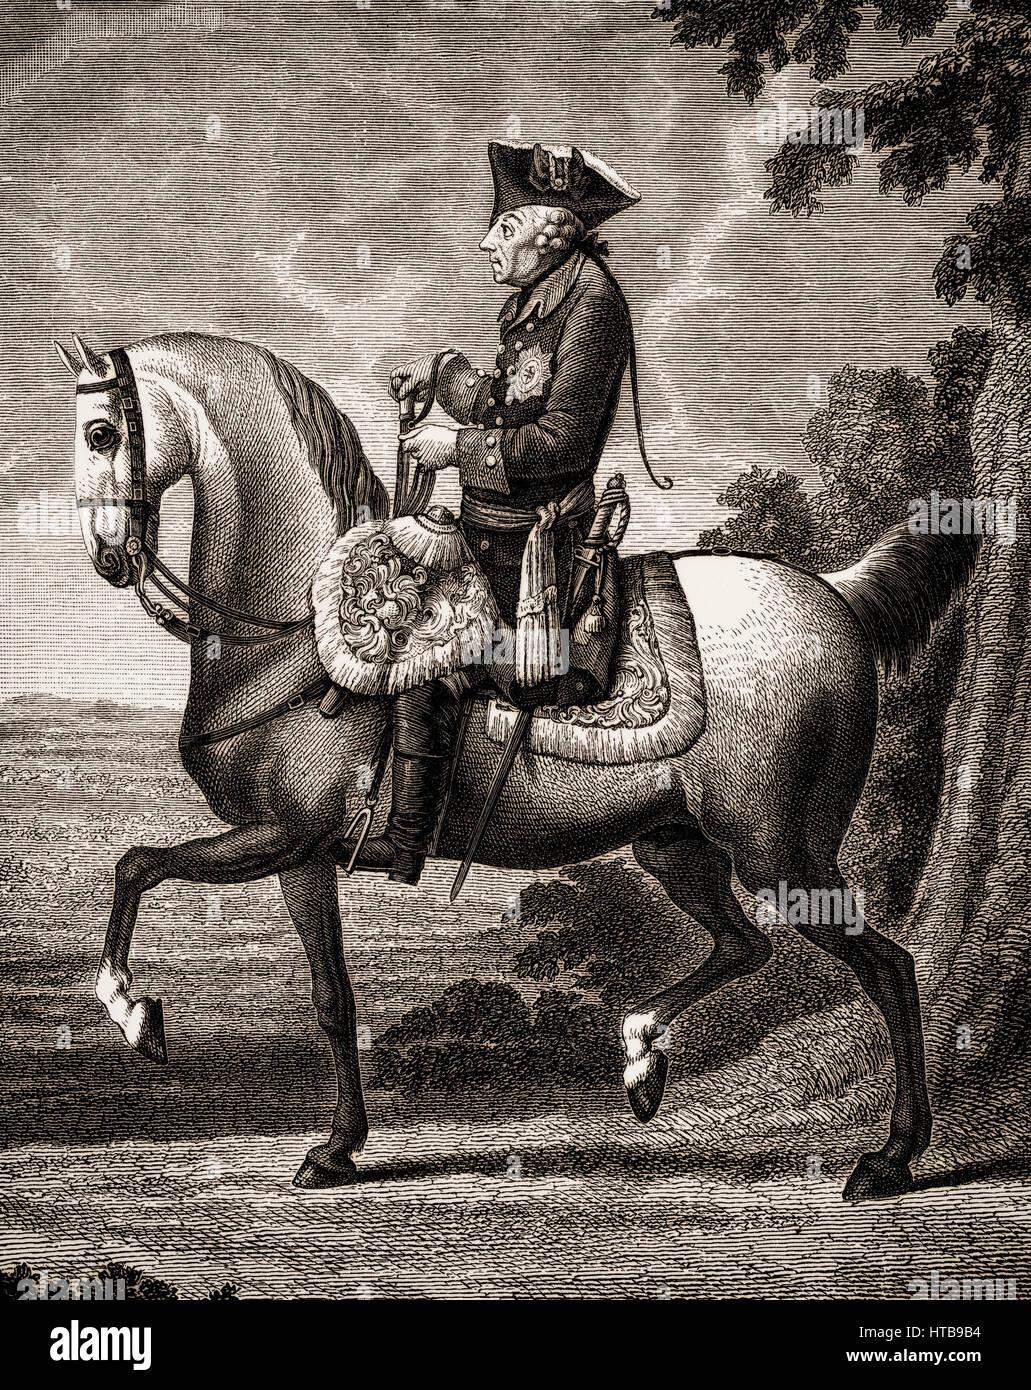 Frederick II, Friedrich II, Frederick the Great, 1712-1786, King of Prussia - Stock Image